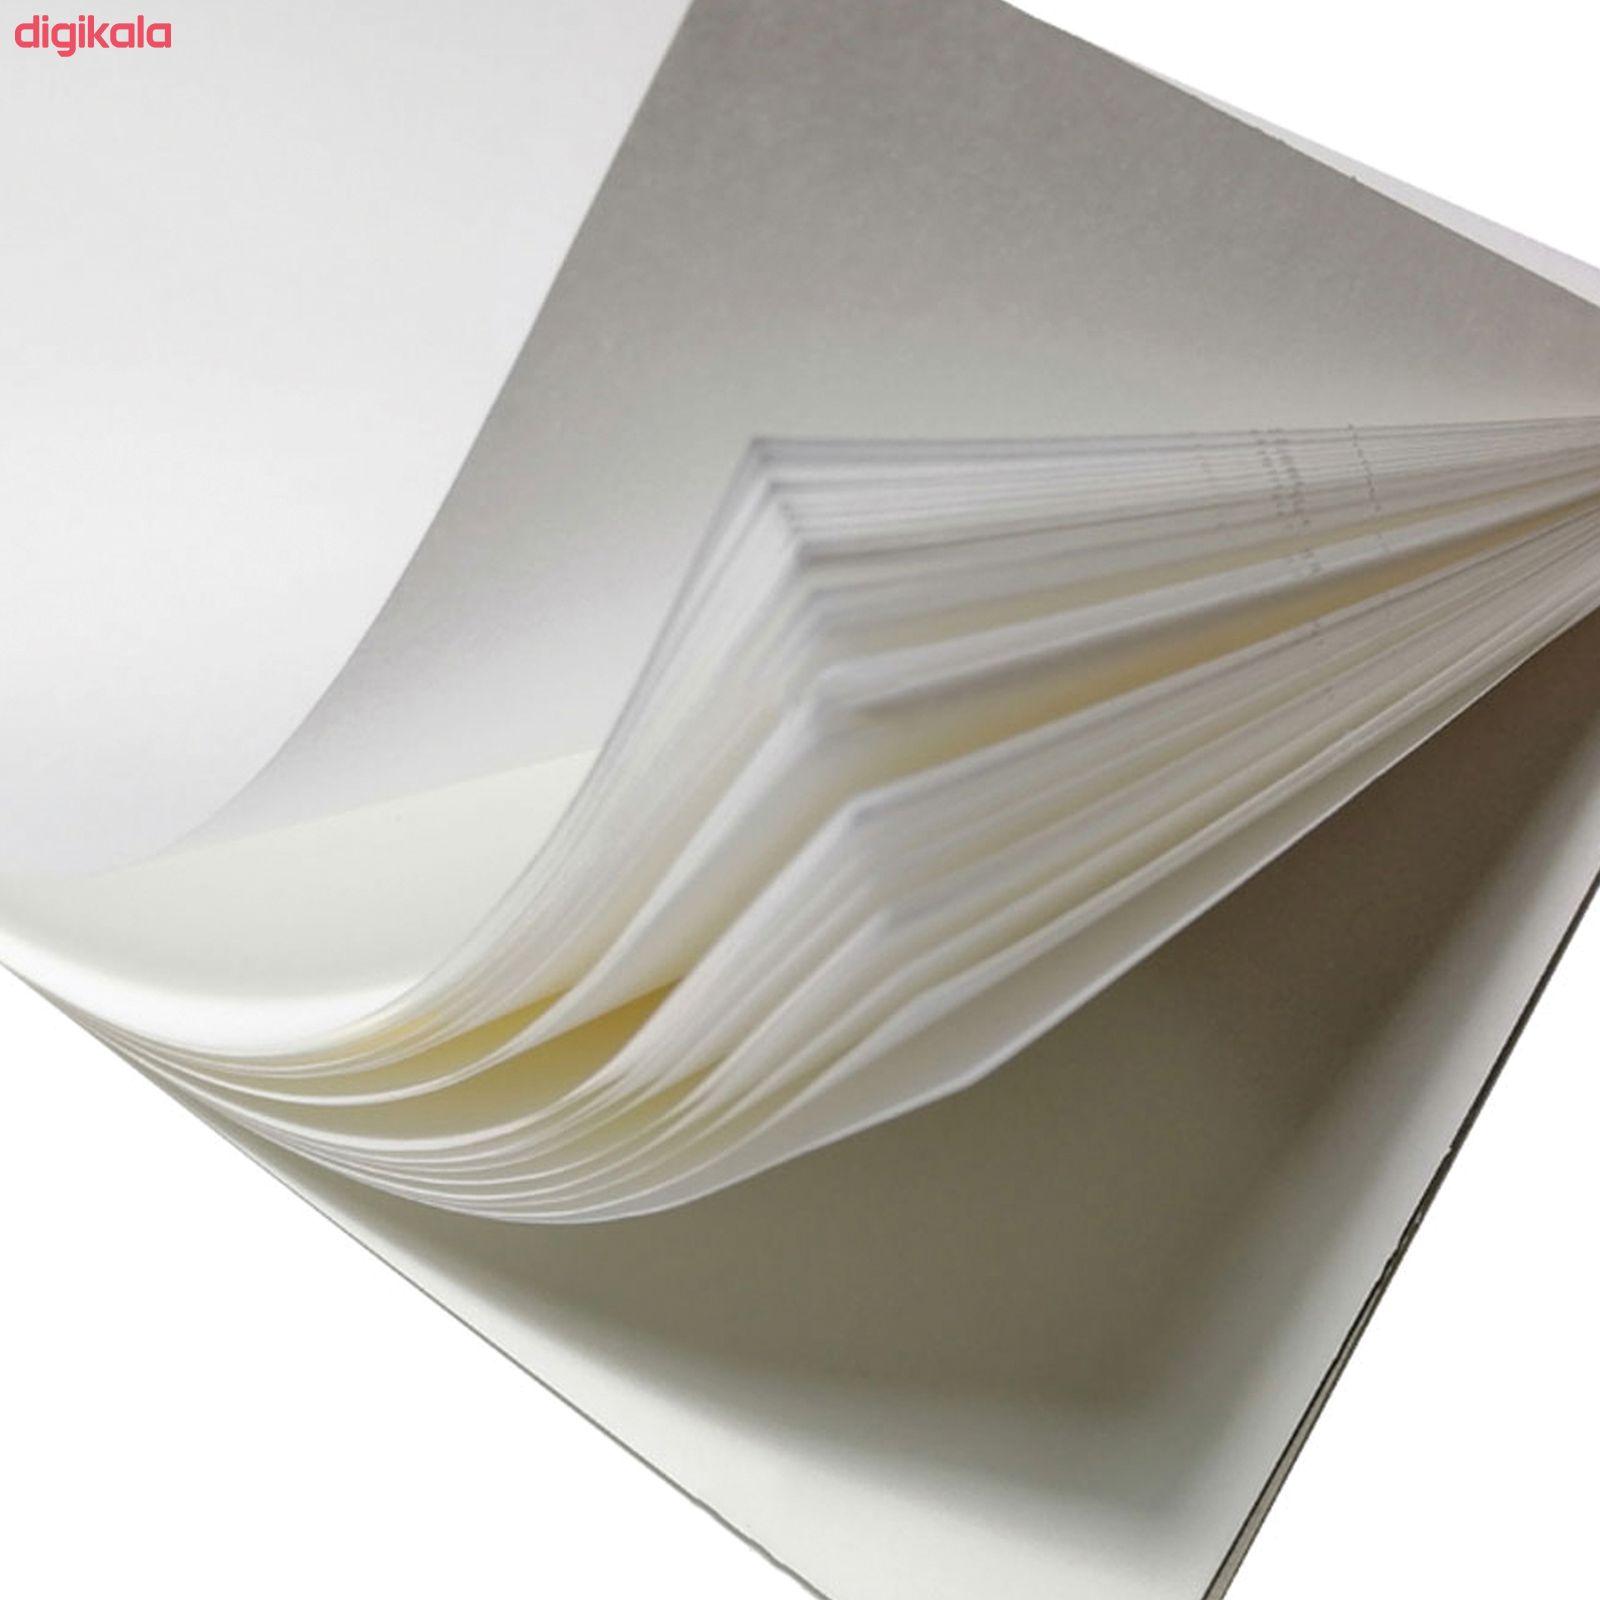 کاغذ طراحی A3 مدل 127A3 بسته 50 عددی  main 1 1